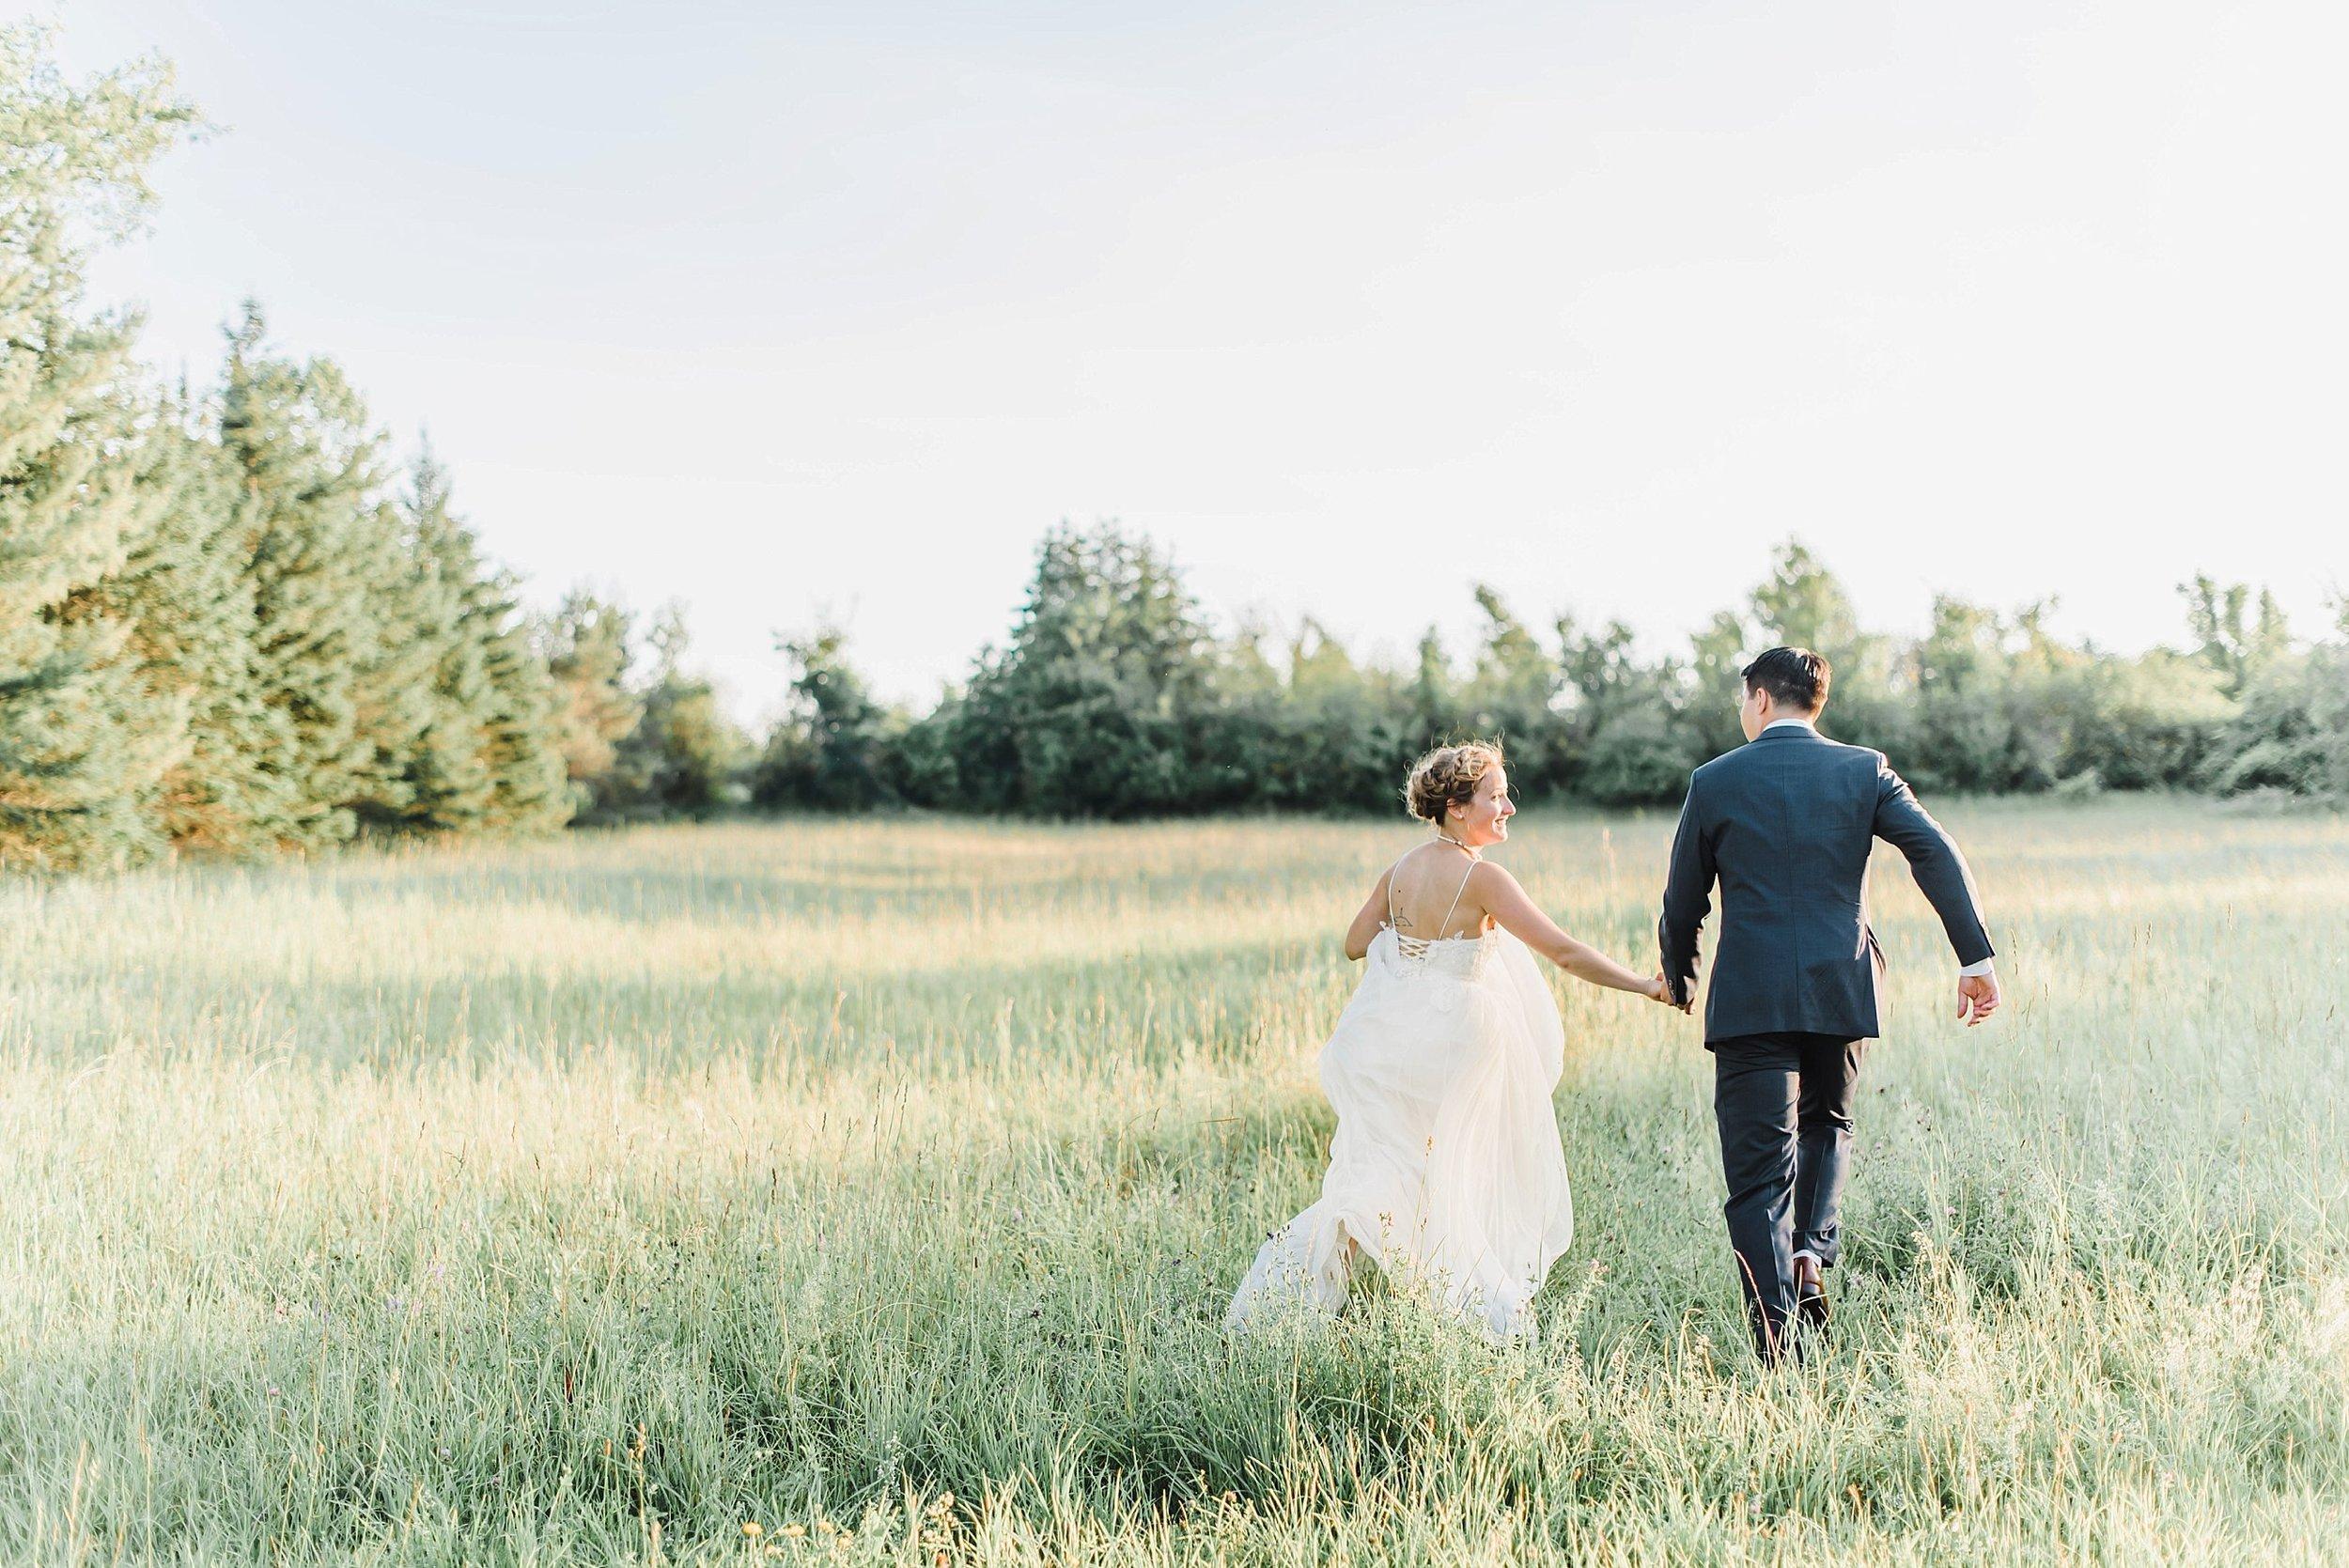 light airy indie fine art ottawa wedding photographer | Ali and Batoul Photography_0897.jpg